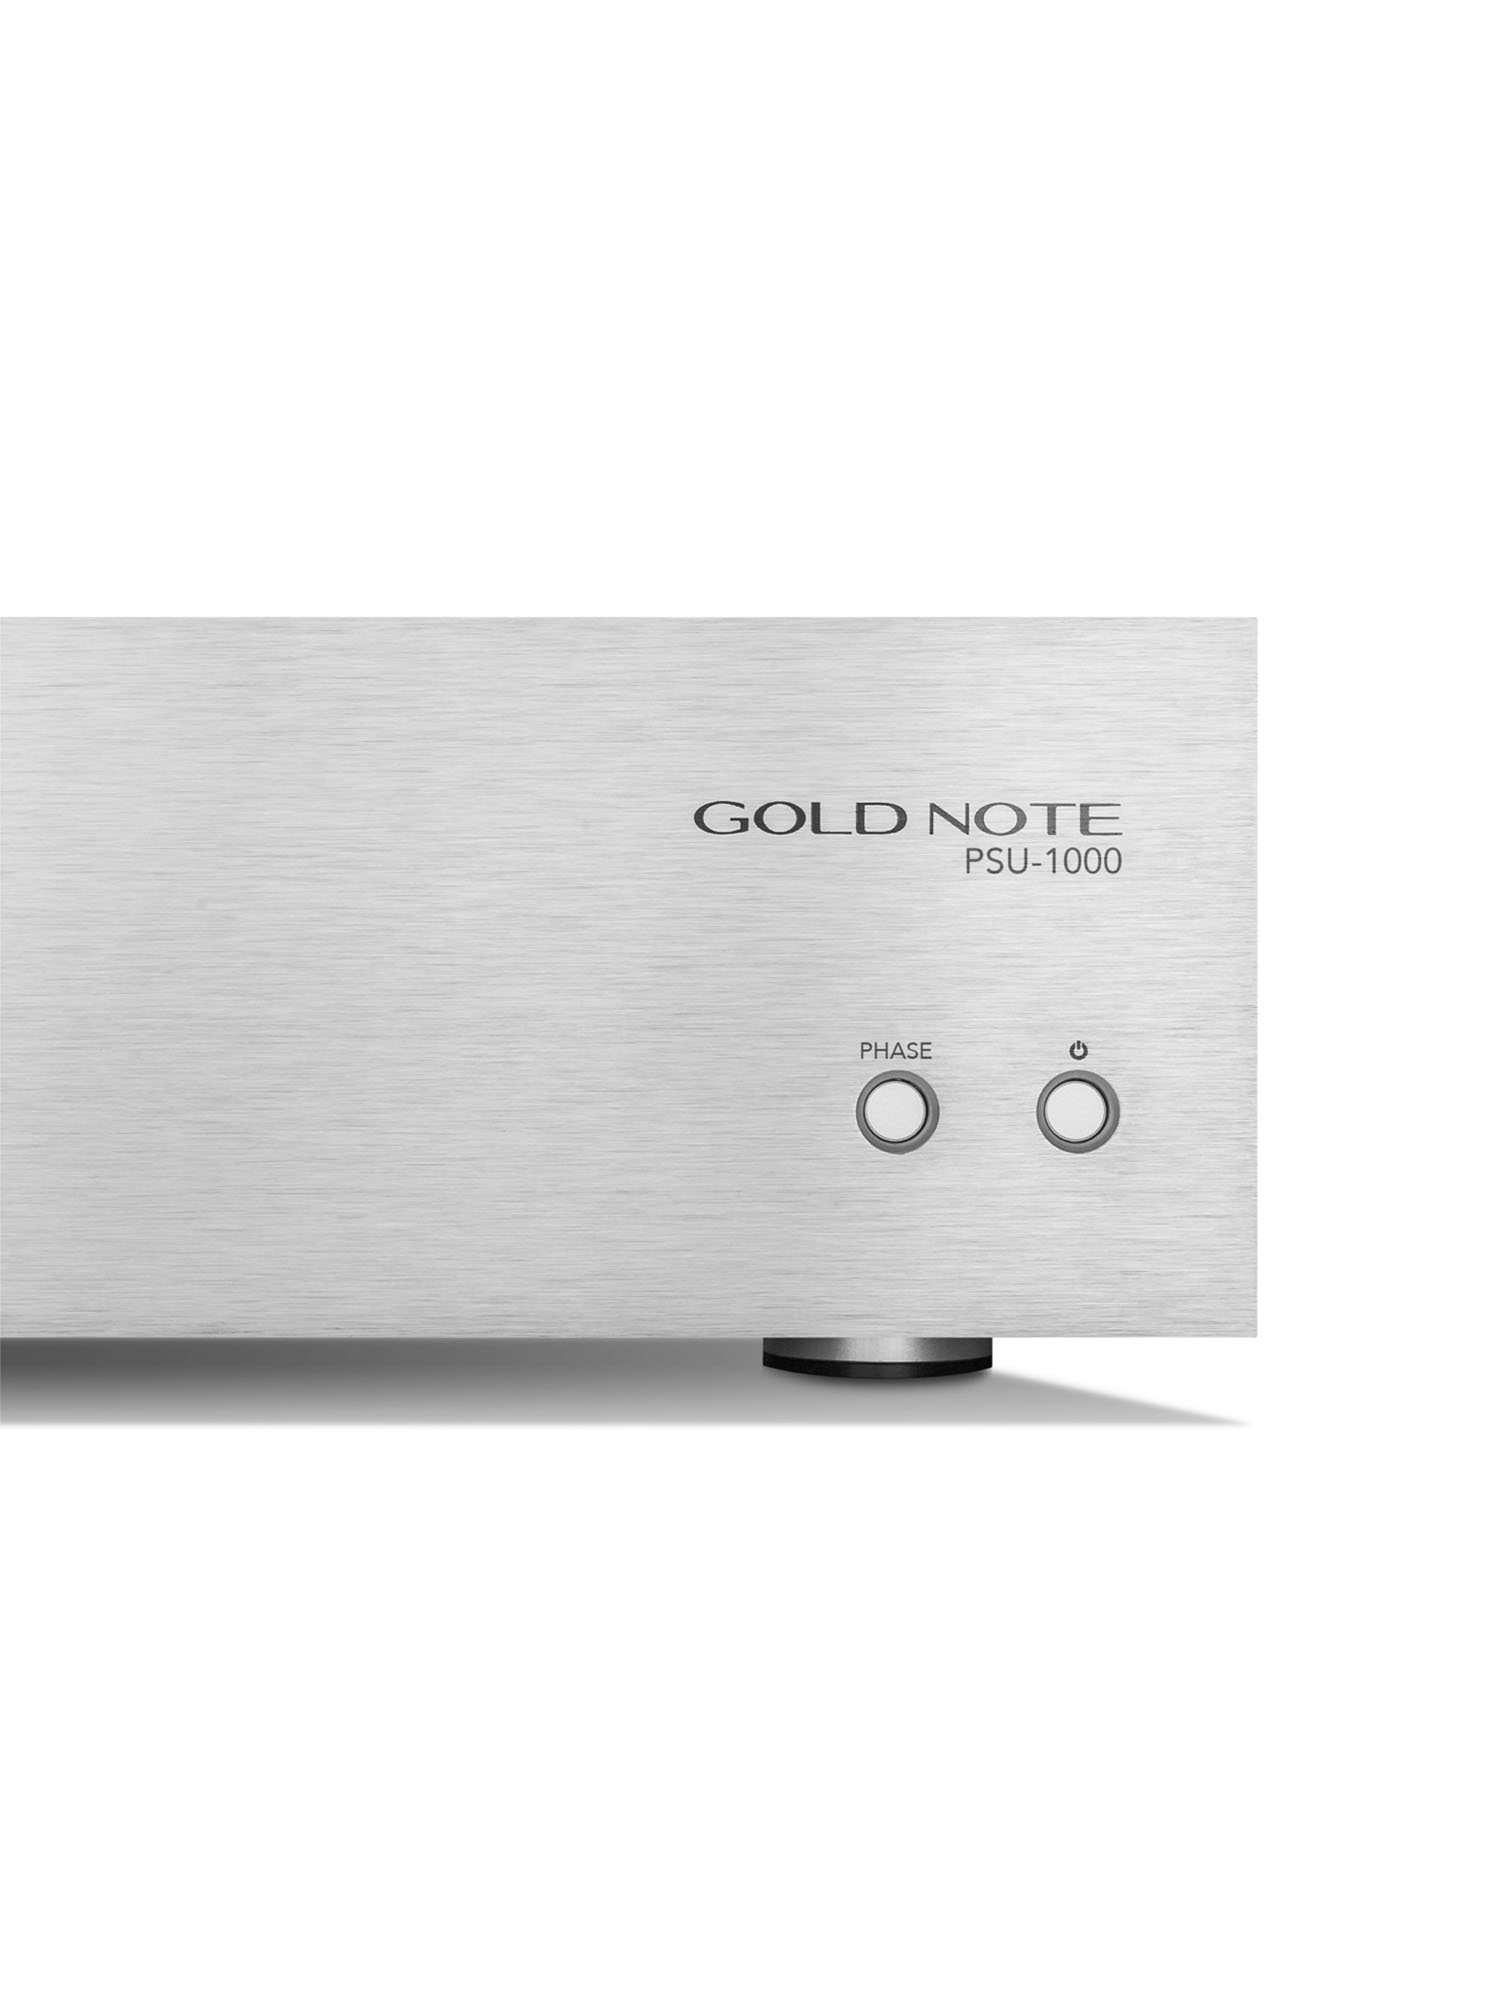 Gold Note PSU-1000 Power Supply